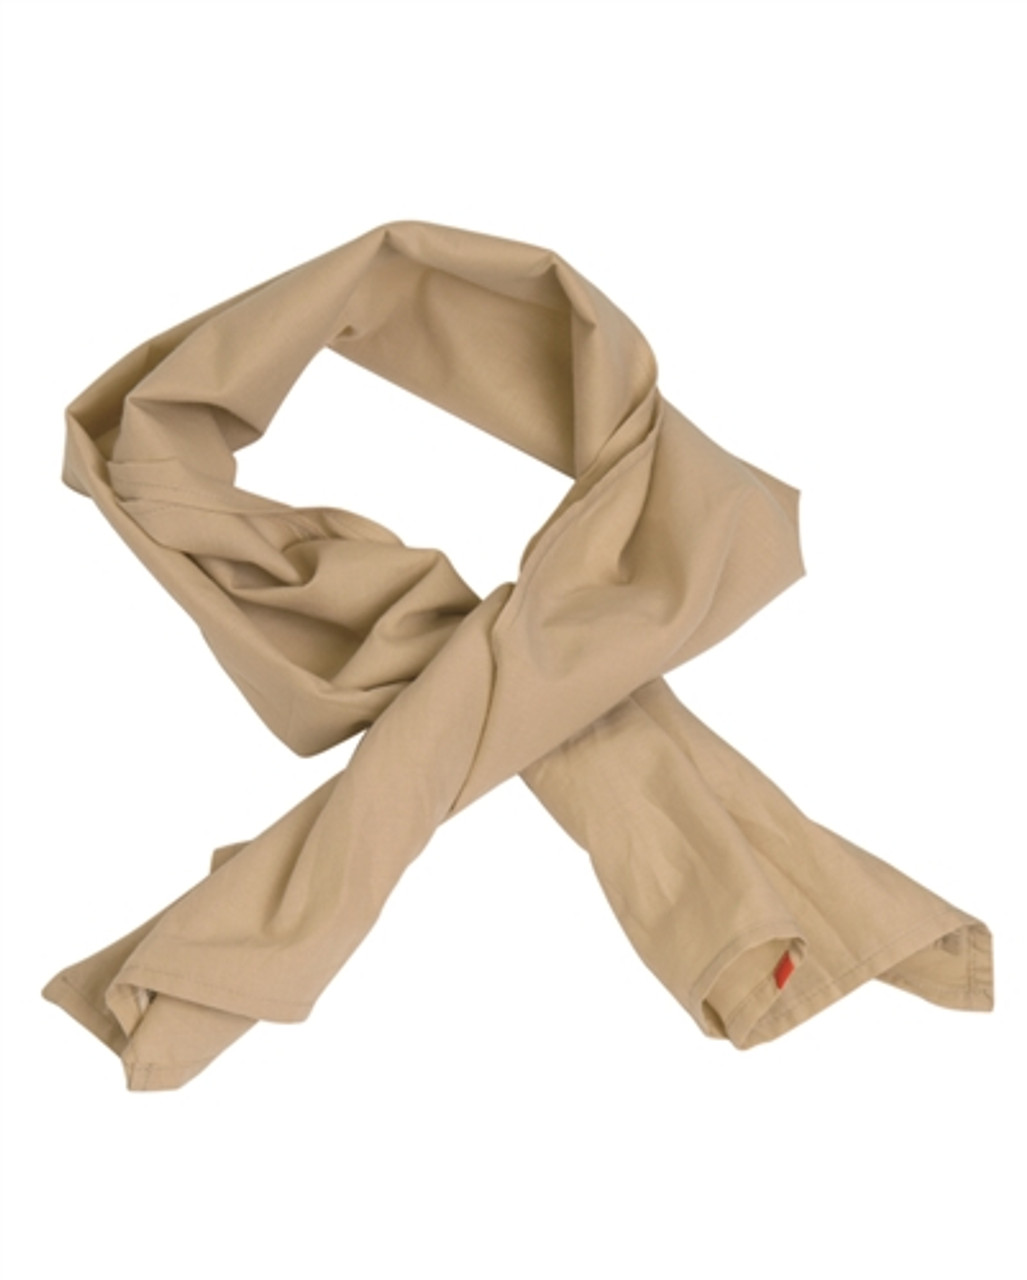 British Military Sweat Rag - Khaki from Hessen Antique